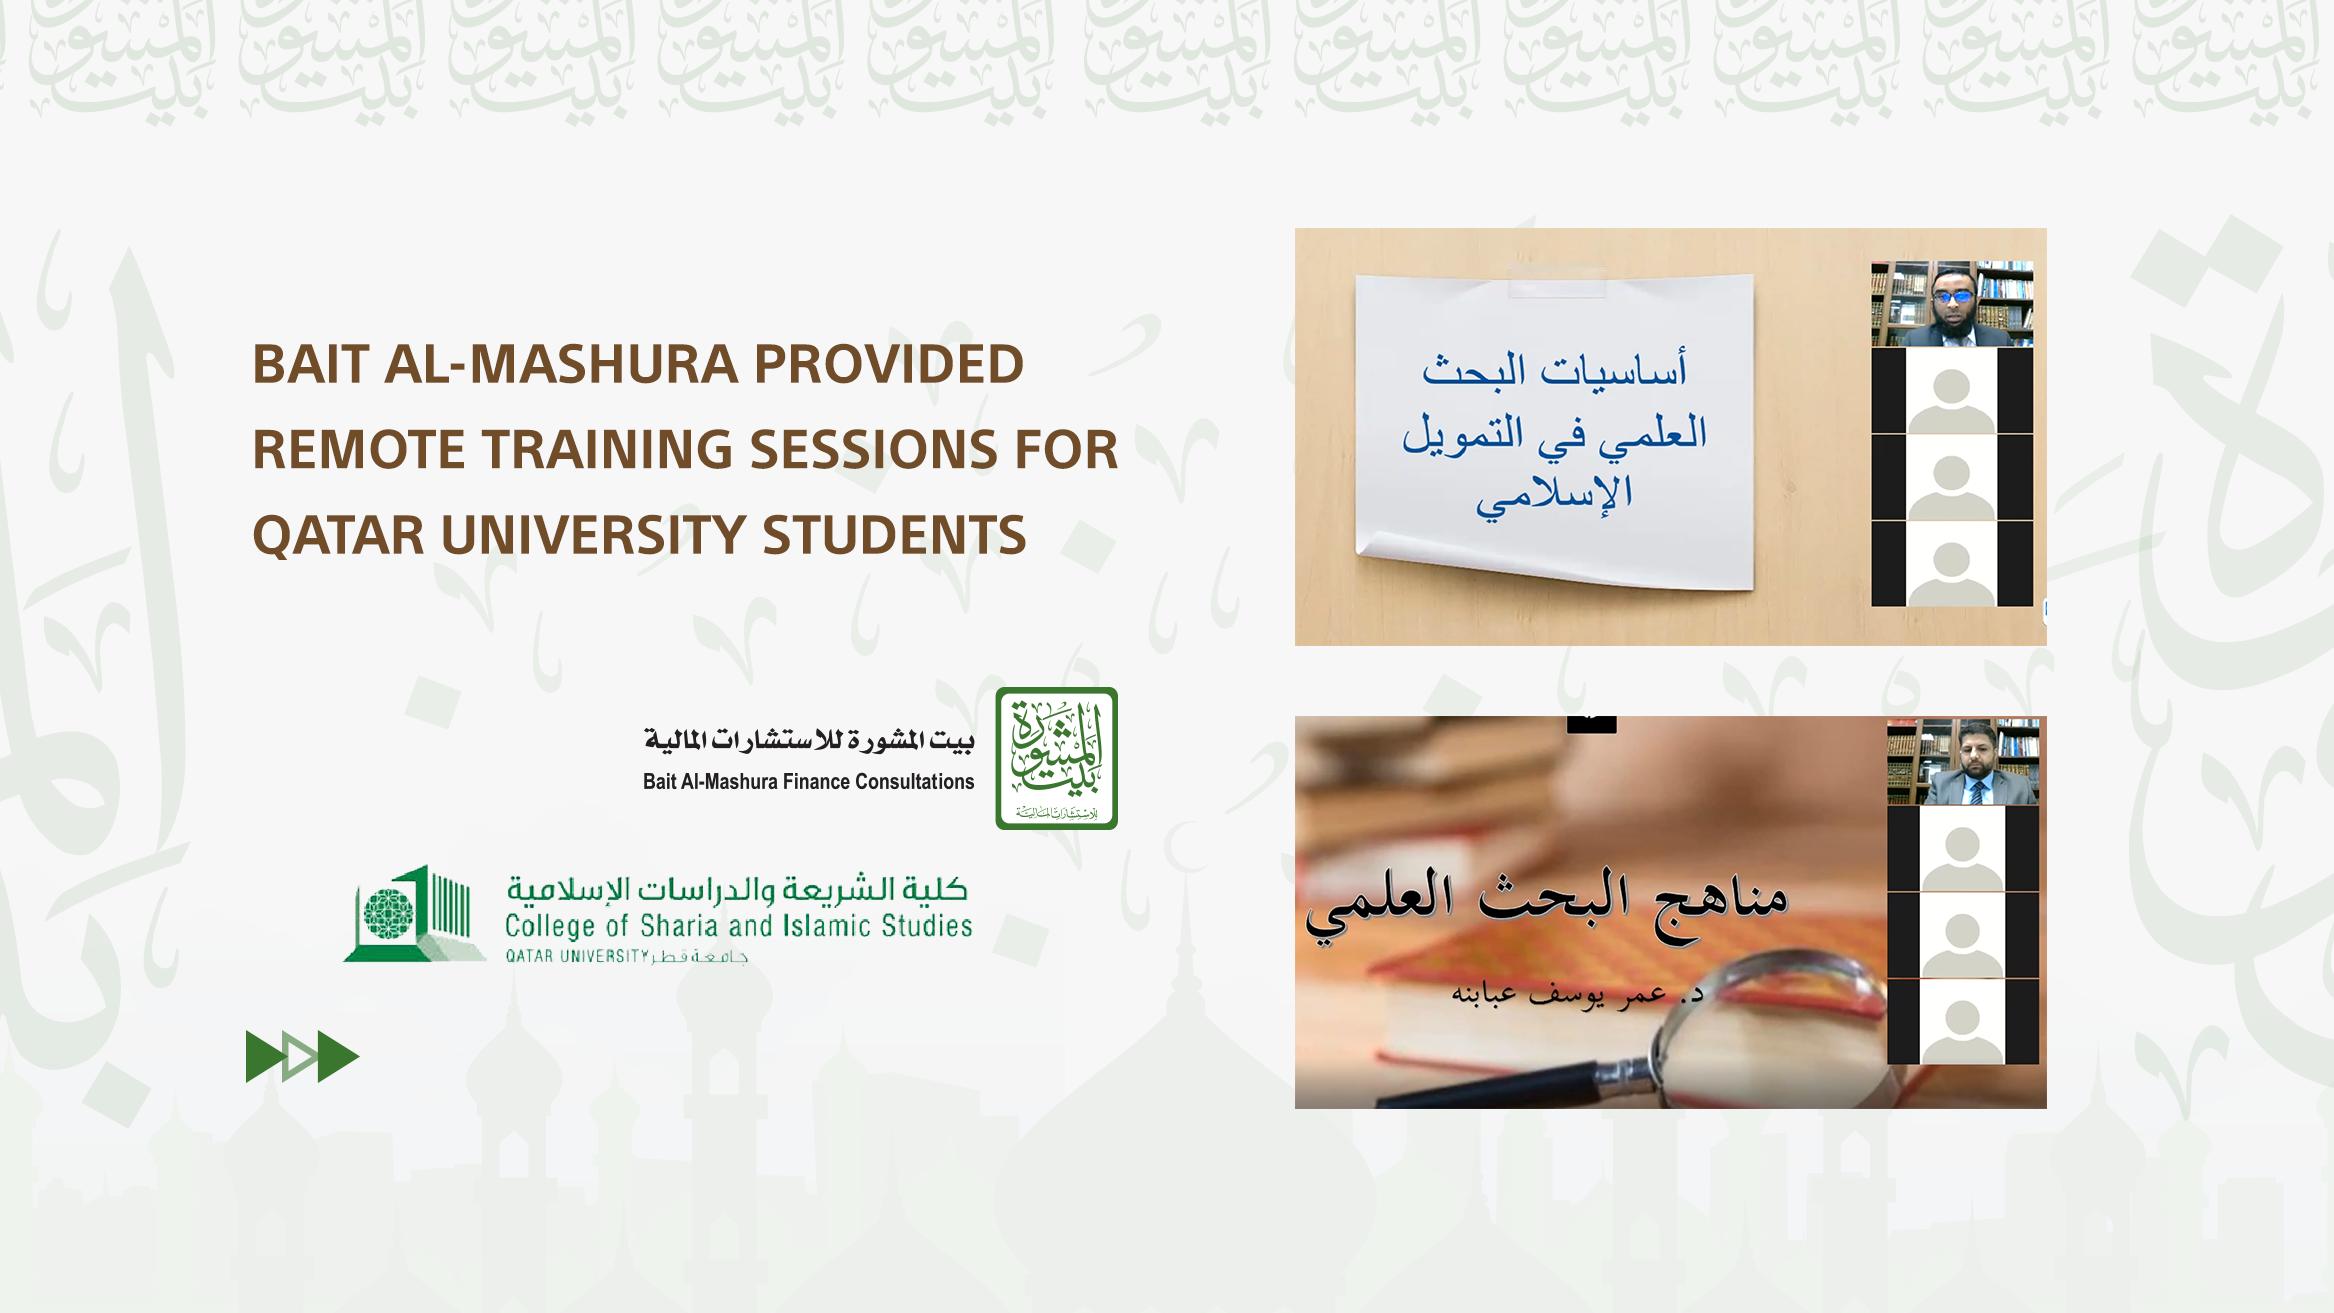 Bait Al-Mashura provided remote training sessions for Qatar university students